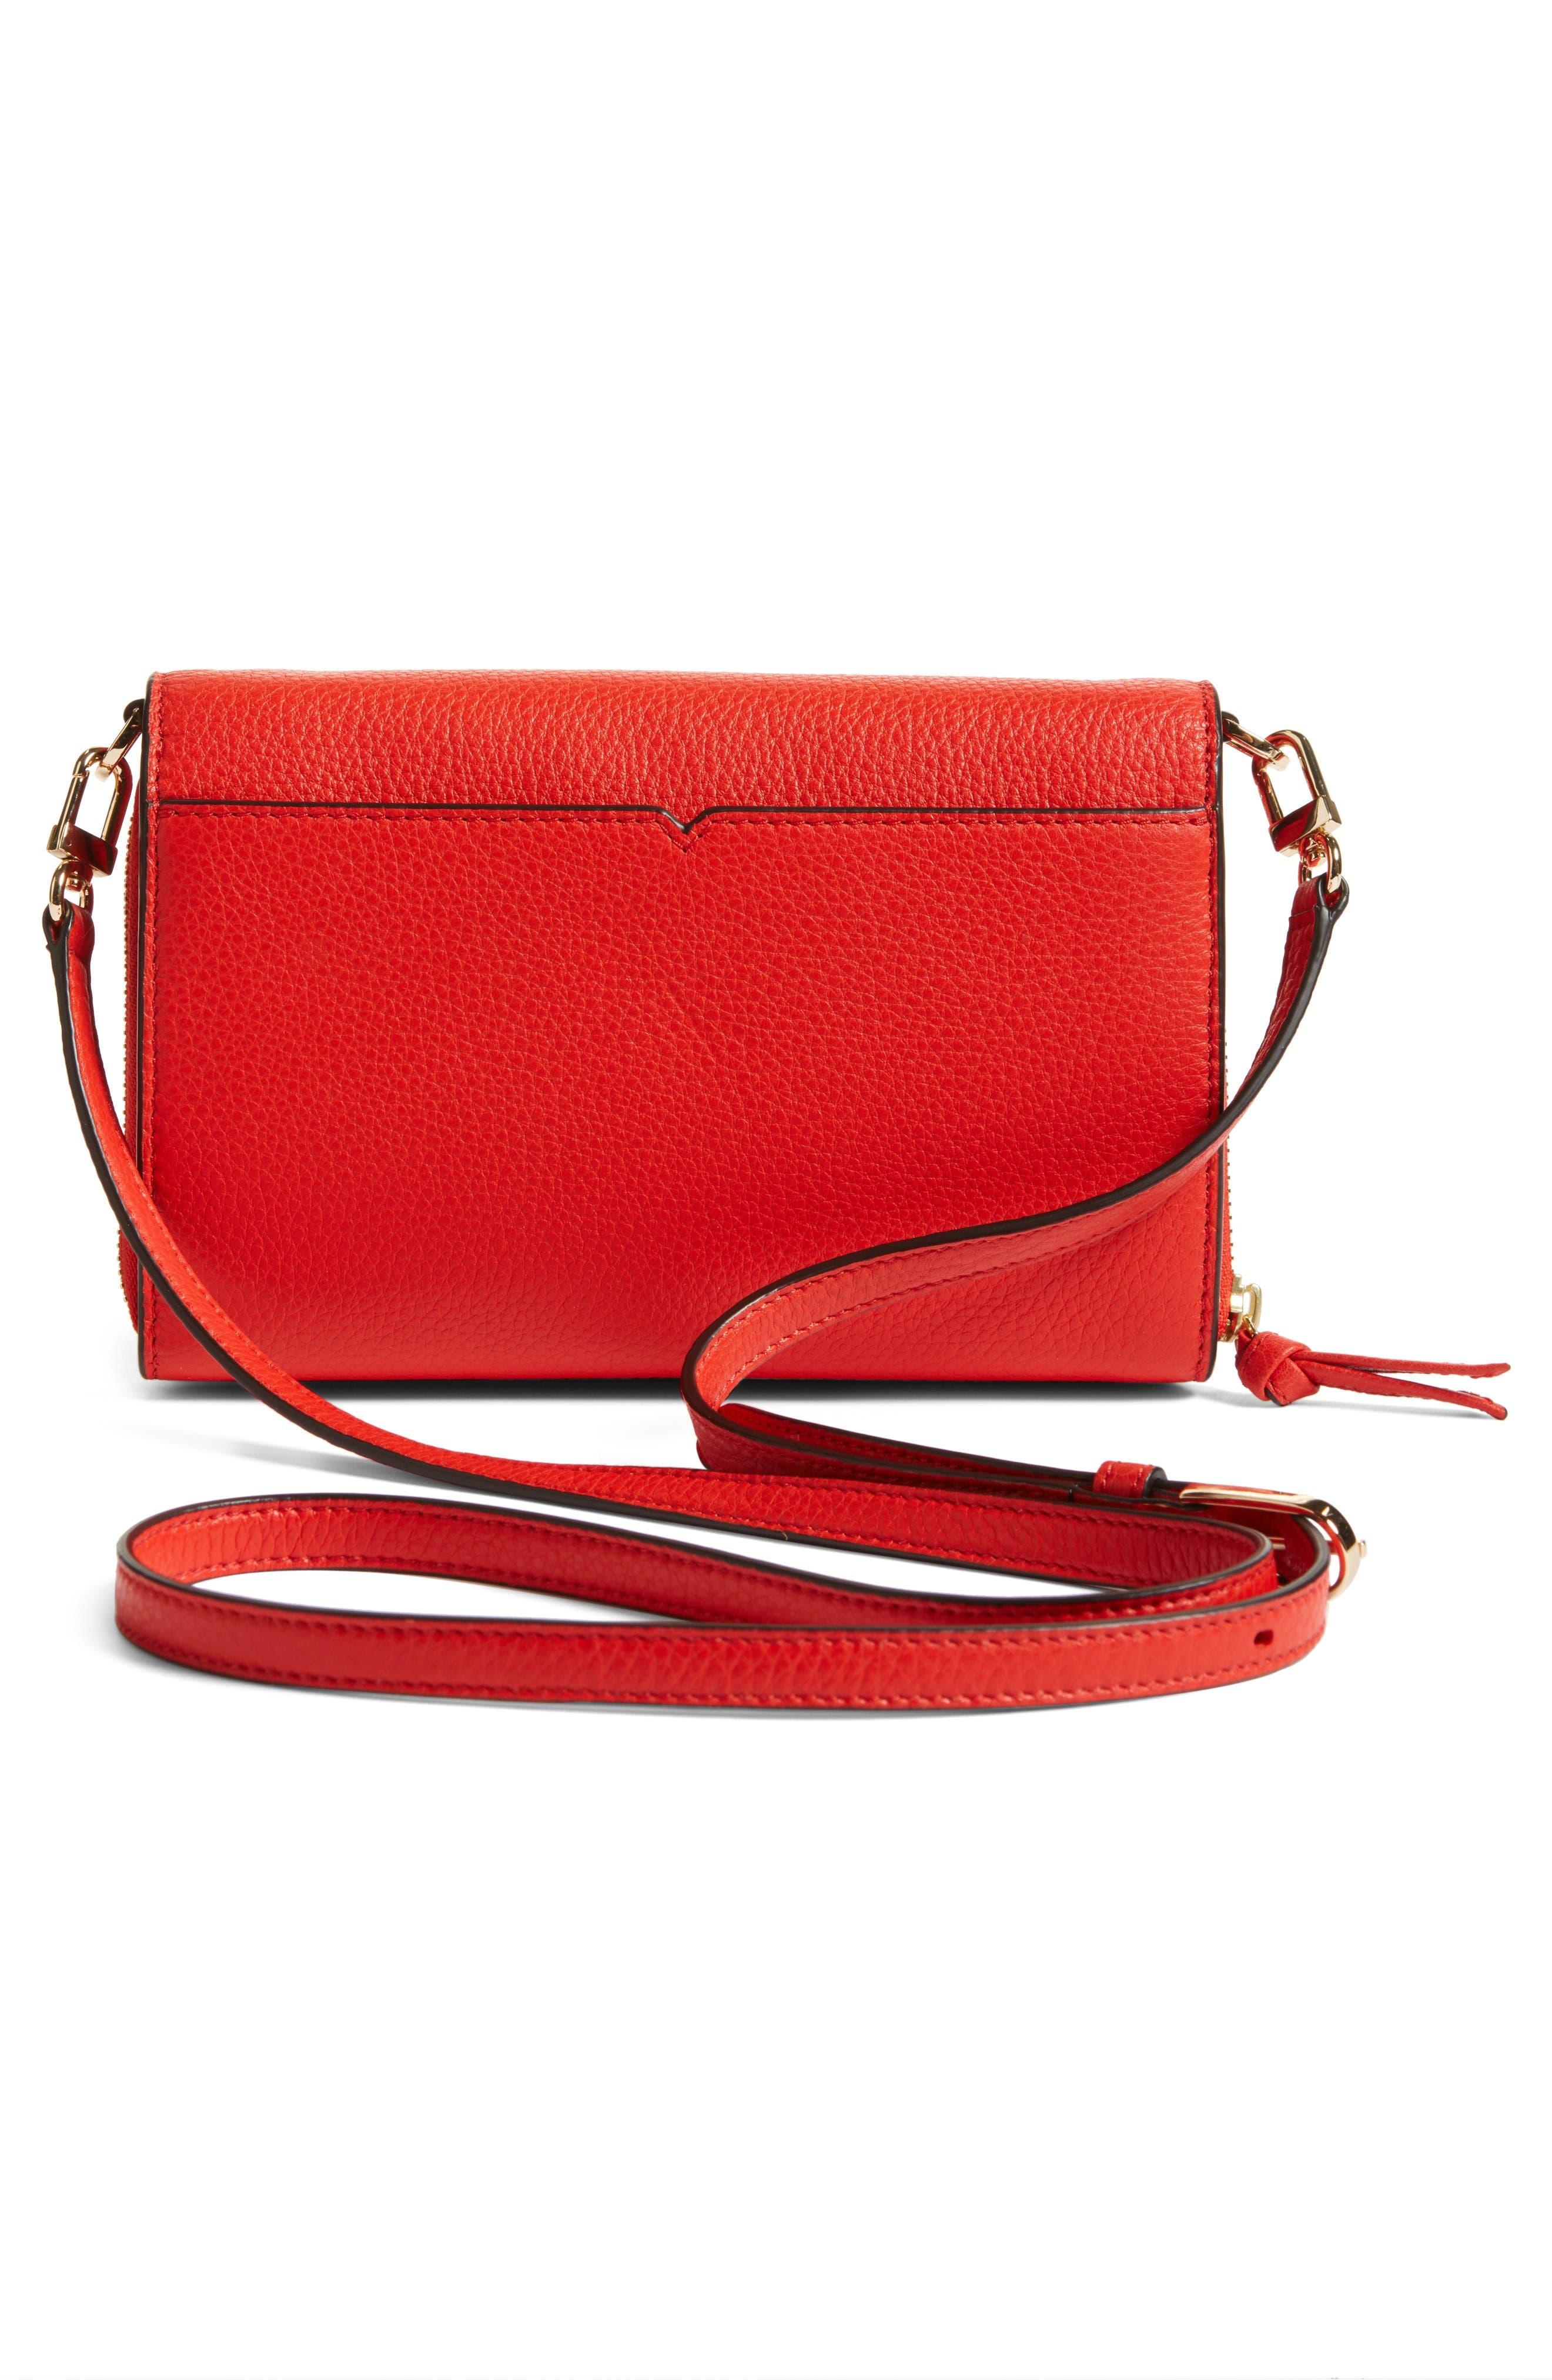 Alternate Image 2  - Tory Burch 'Harper' Pebbled Leather Wallet Crossbody Bag